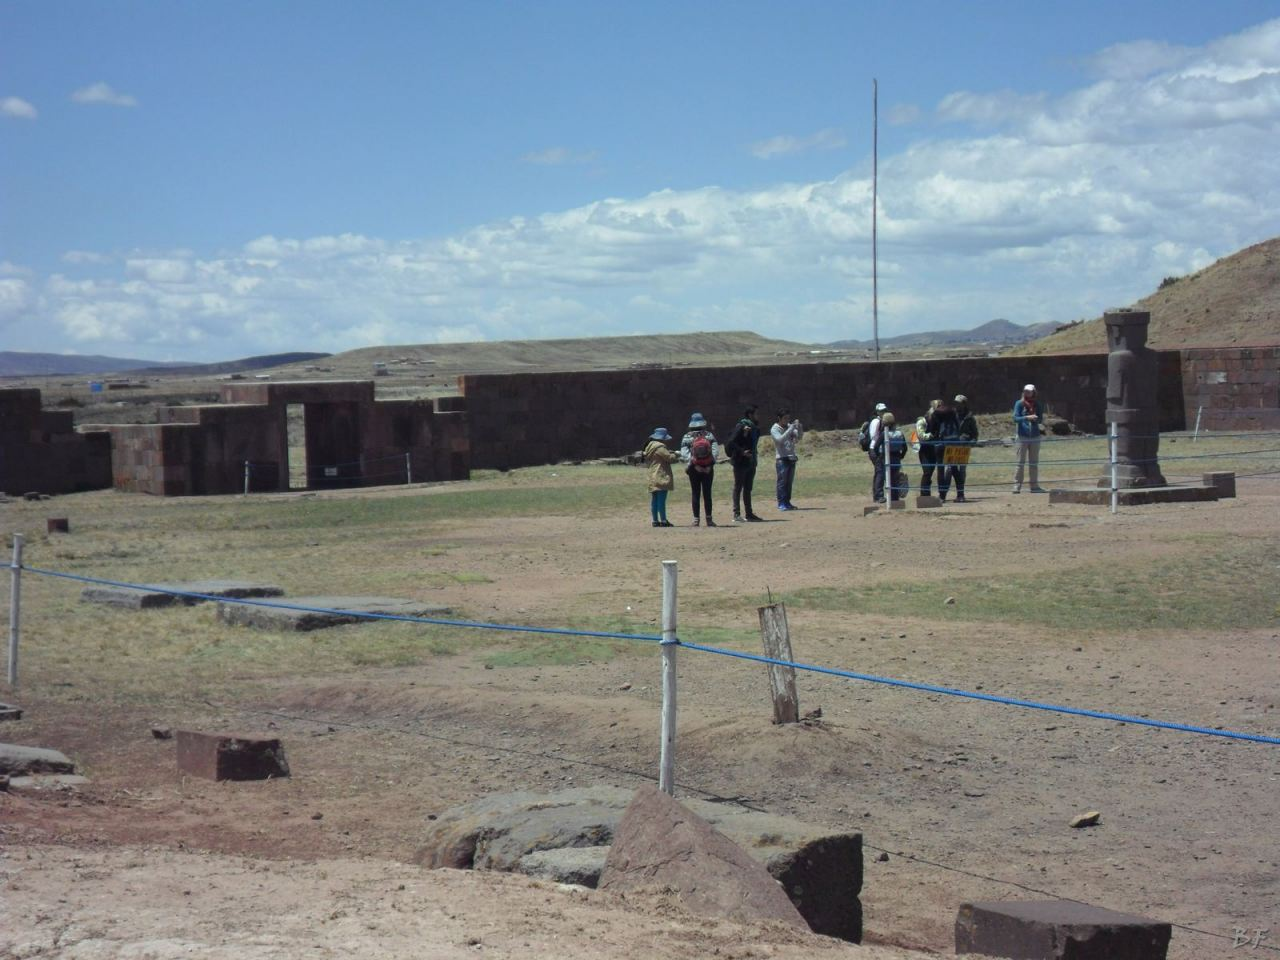 Sito-Megalitico-Piramide-Akapana-Kalasasaya-Menhir-Tiahuanaco-Bolivia-32